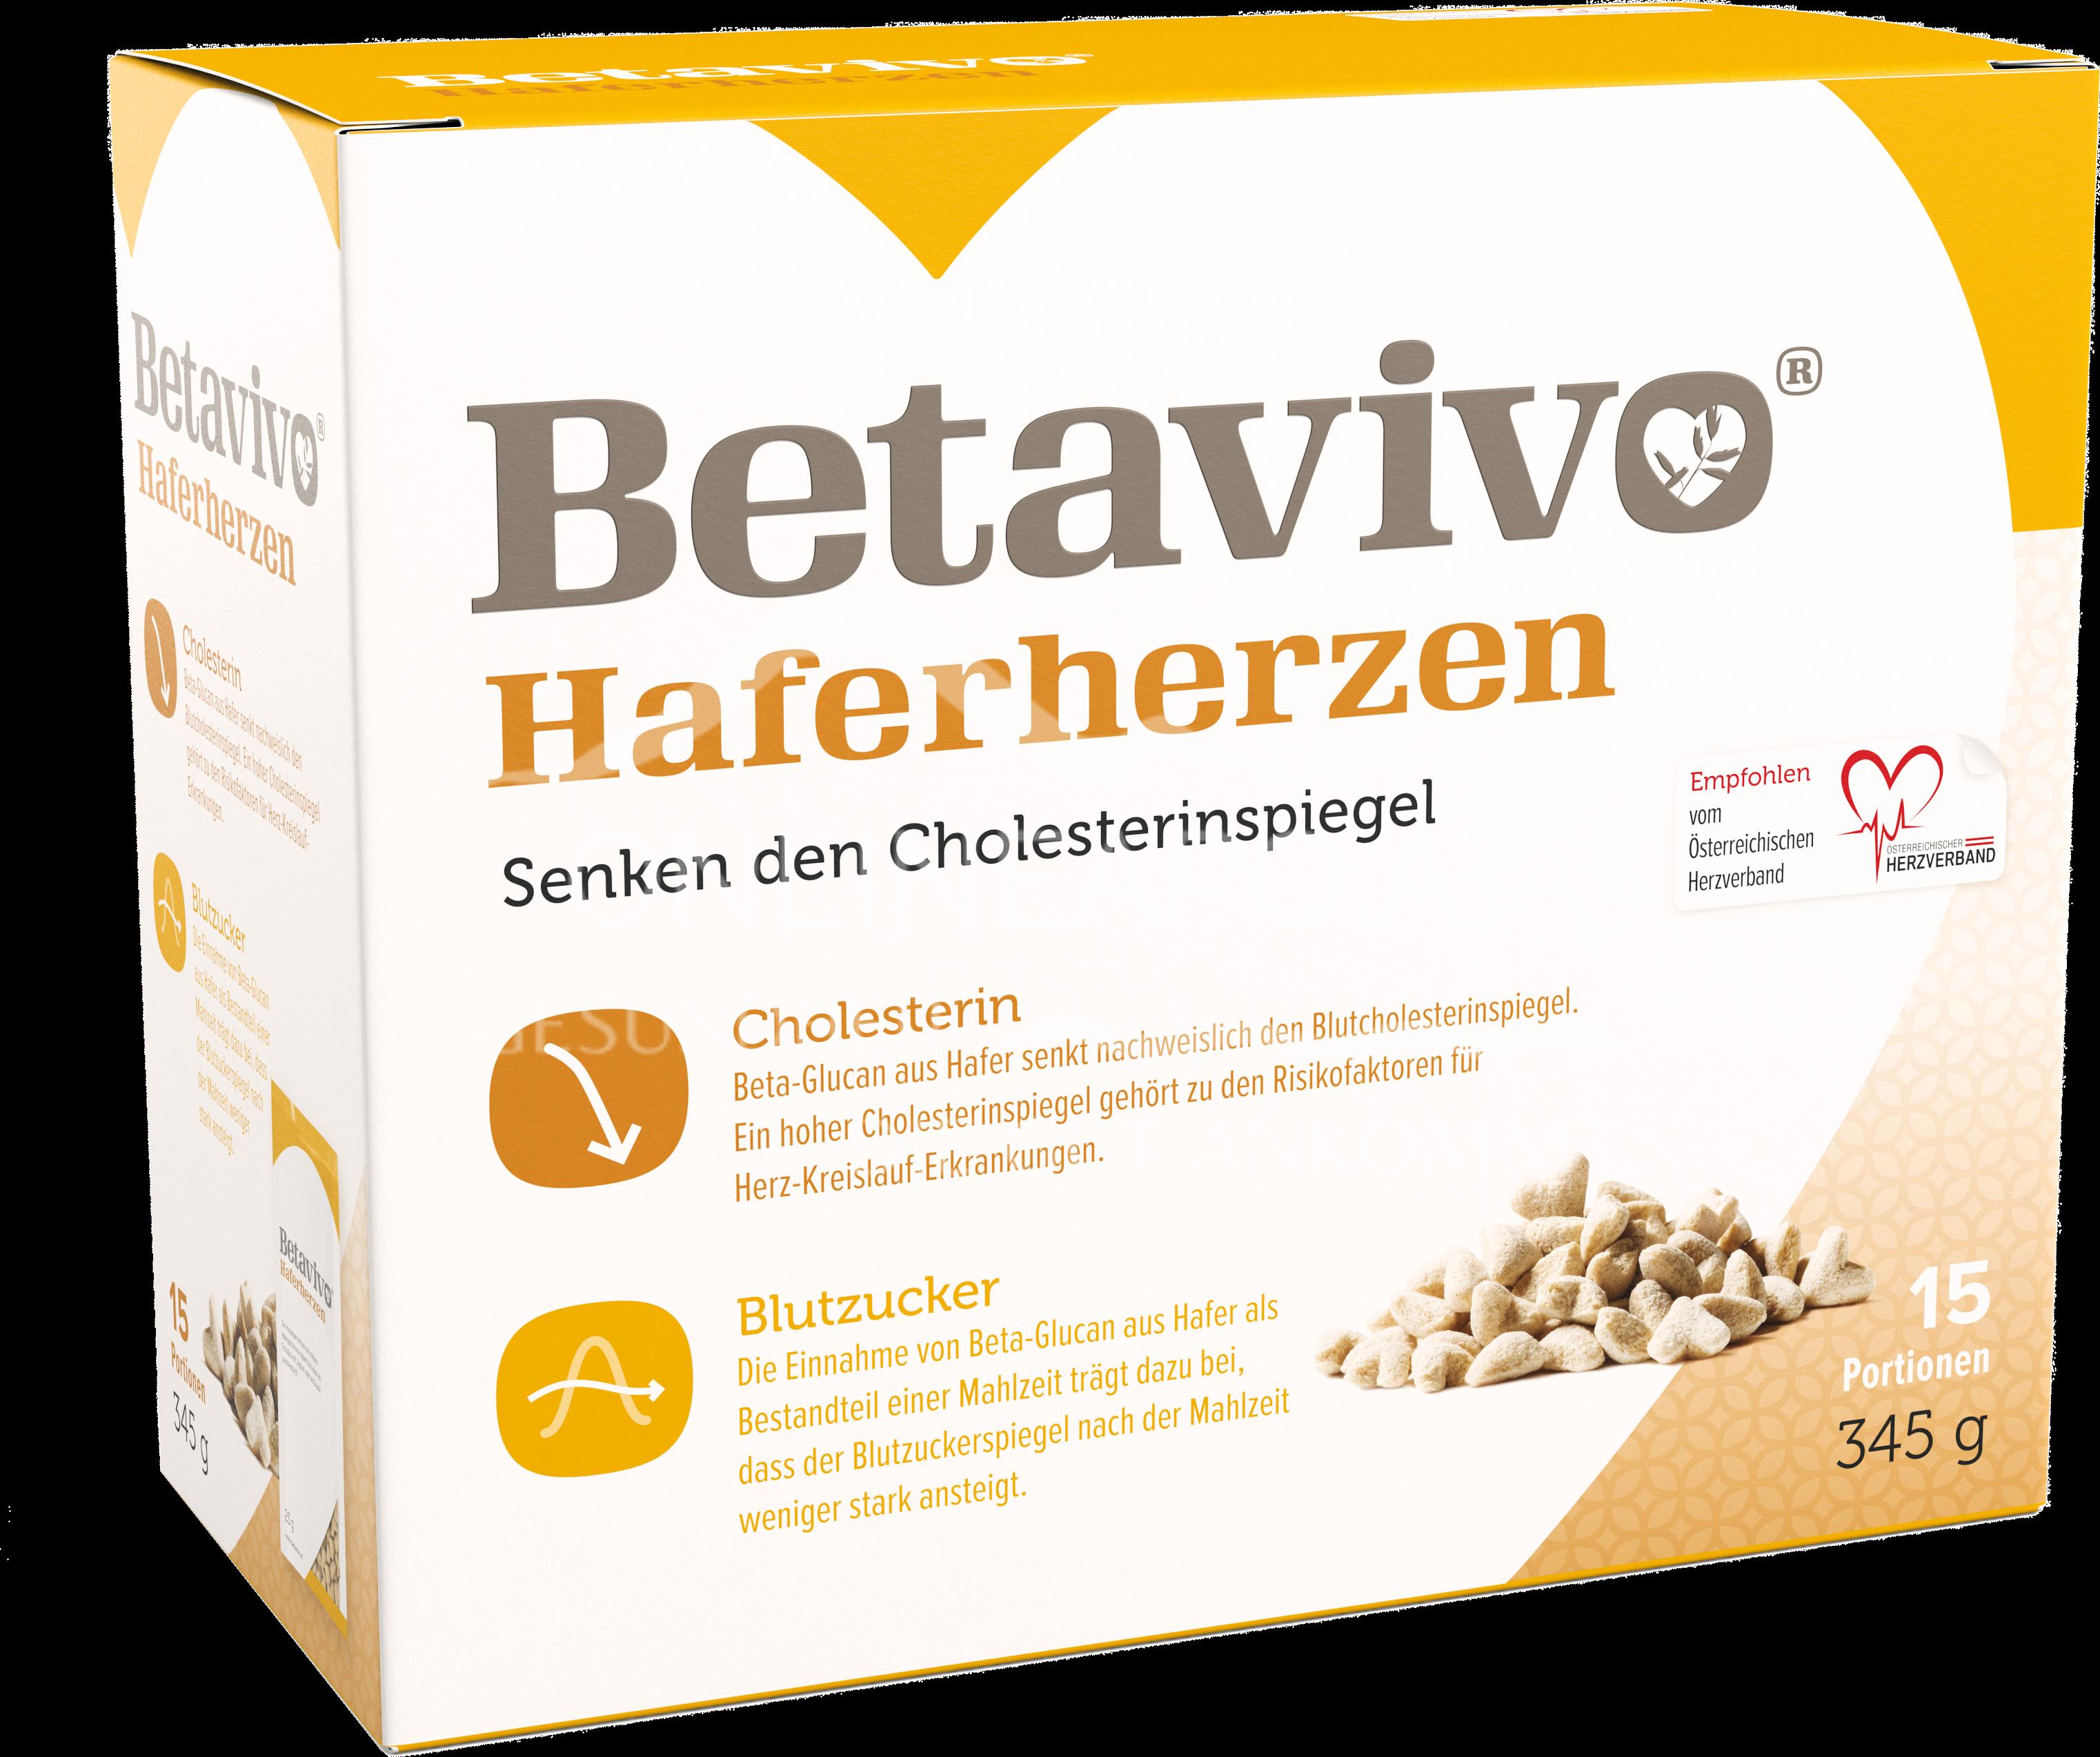 Betavivo Haferherzen